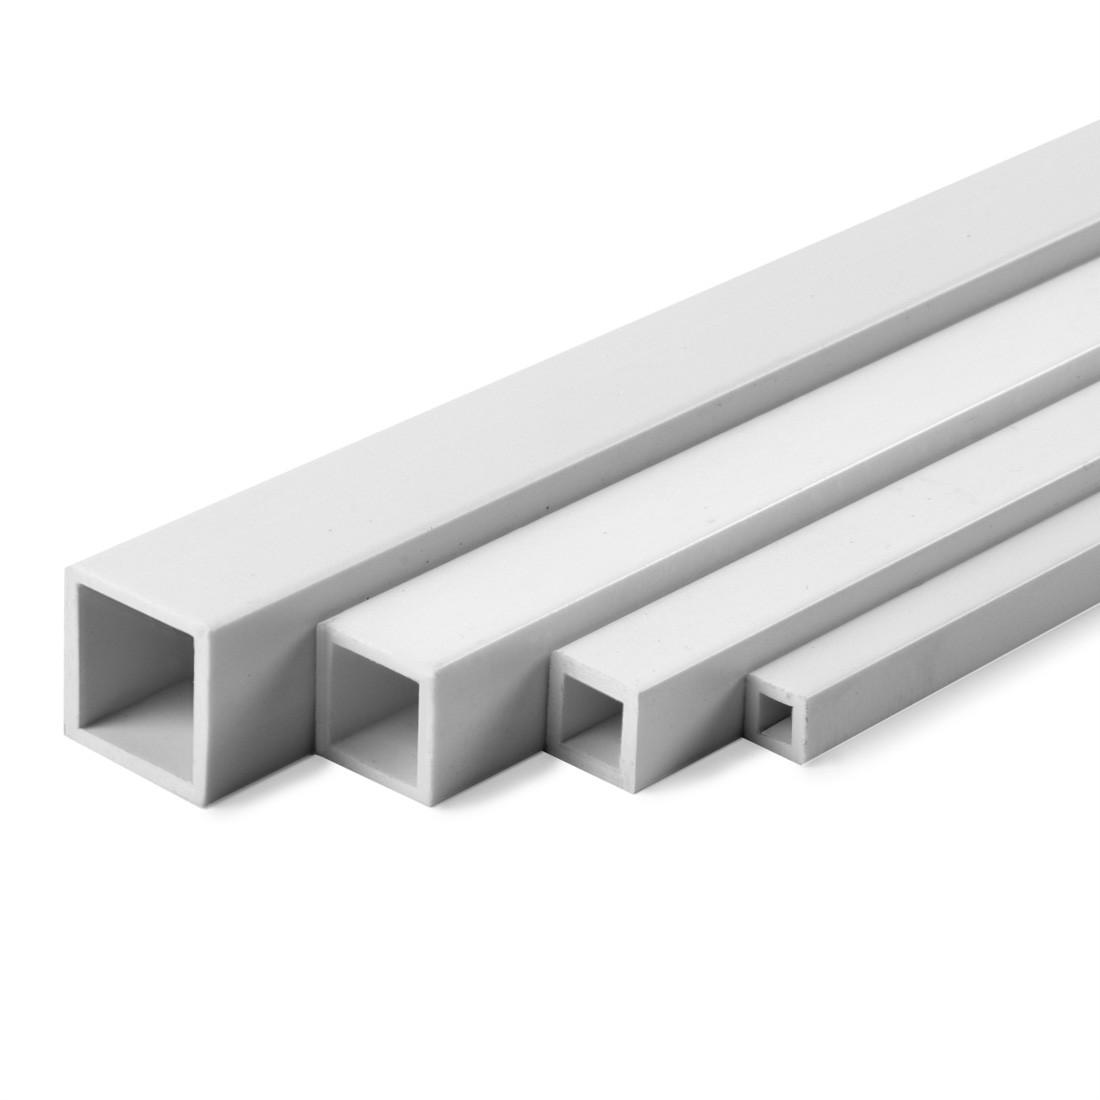 ASA square tube profile mm.2x4x1000